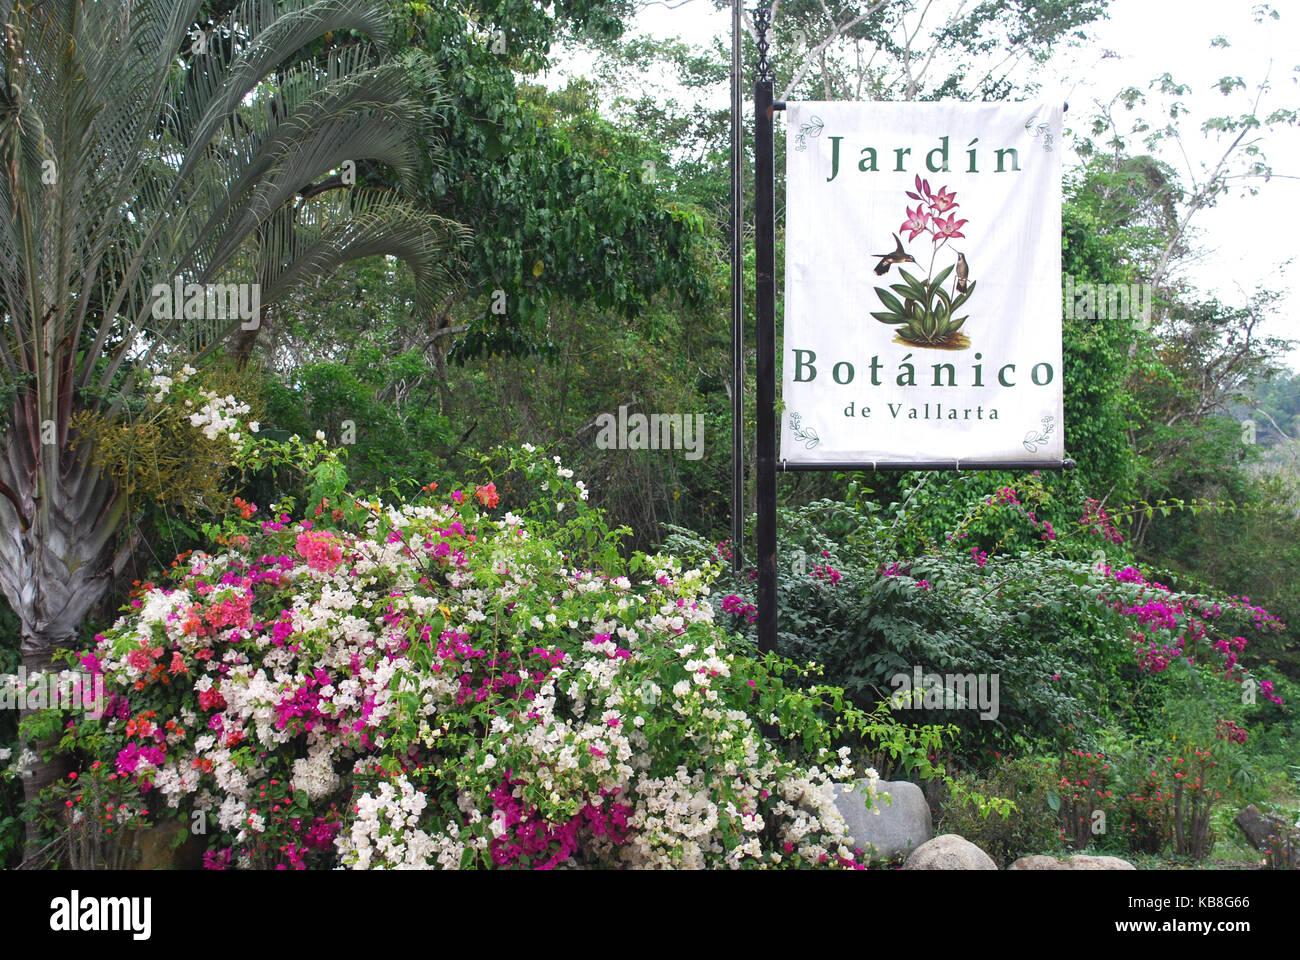 Botanical Gardens Of Puerto Vallarta, Jardin Botanico De Vallarta, Puerto  Vallarta, Mexico